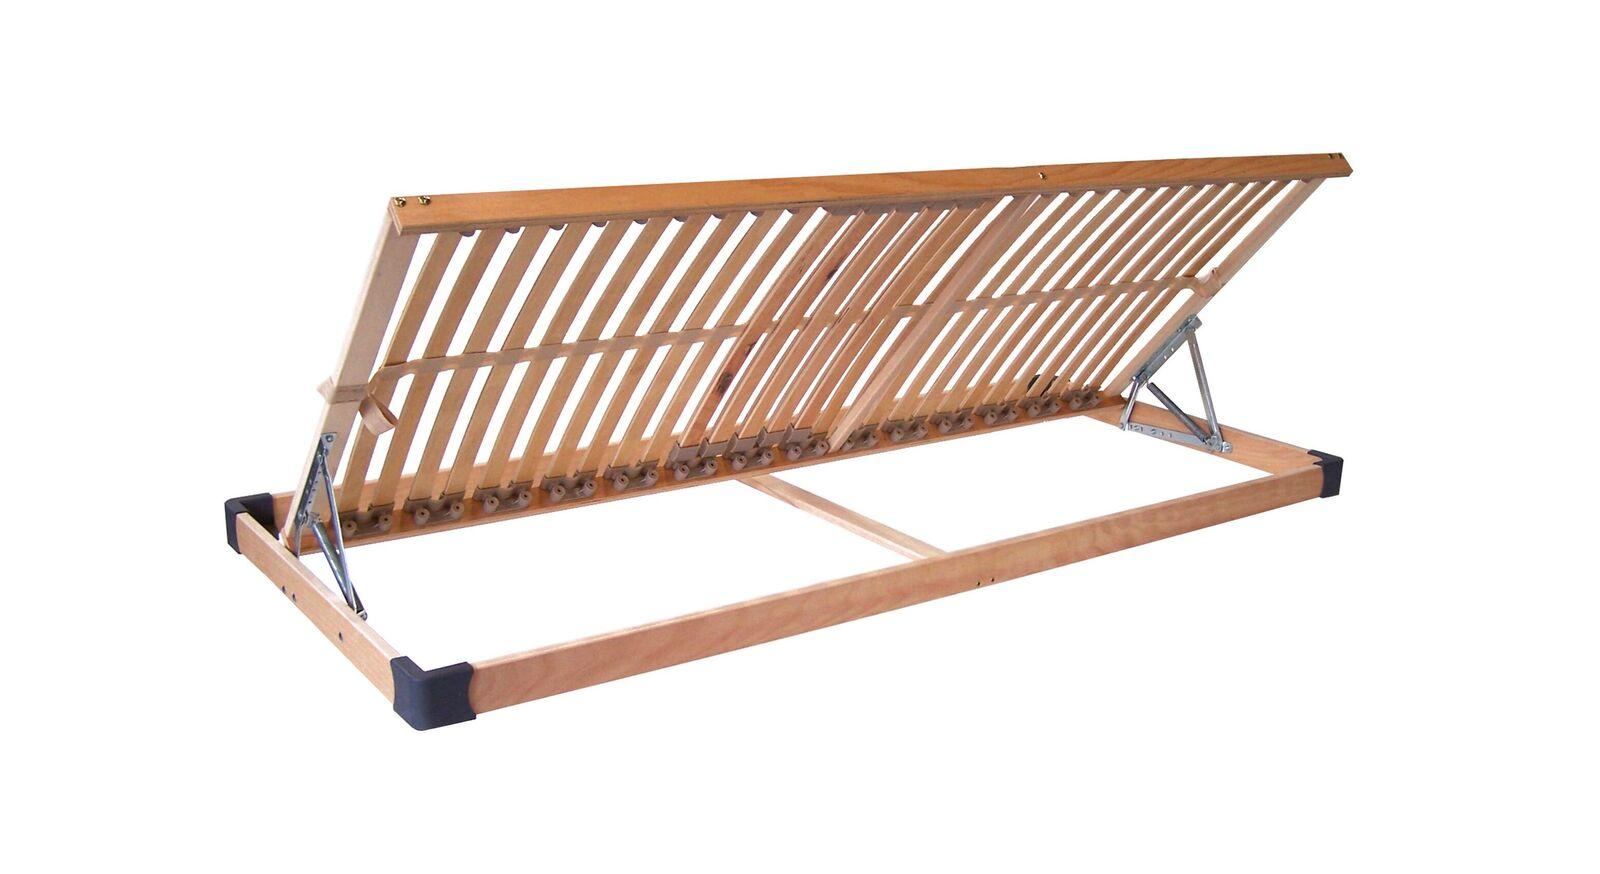 Lattenrost orthowell klappfix mit 28 Federholzleisten